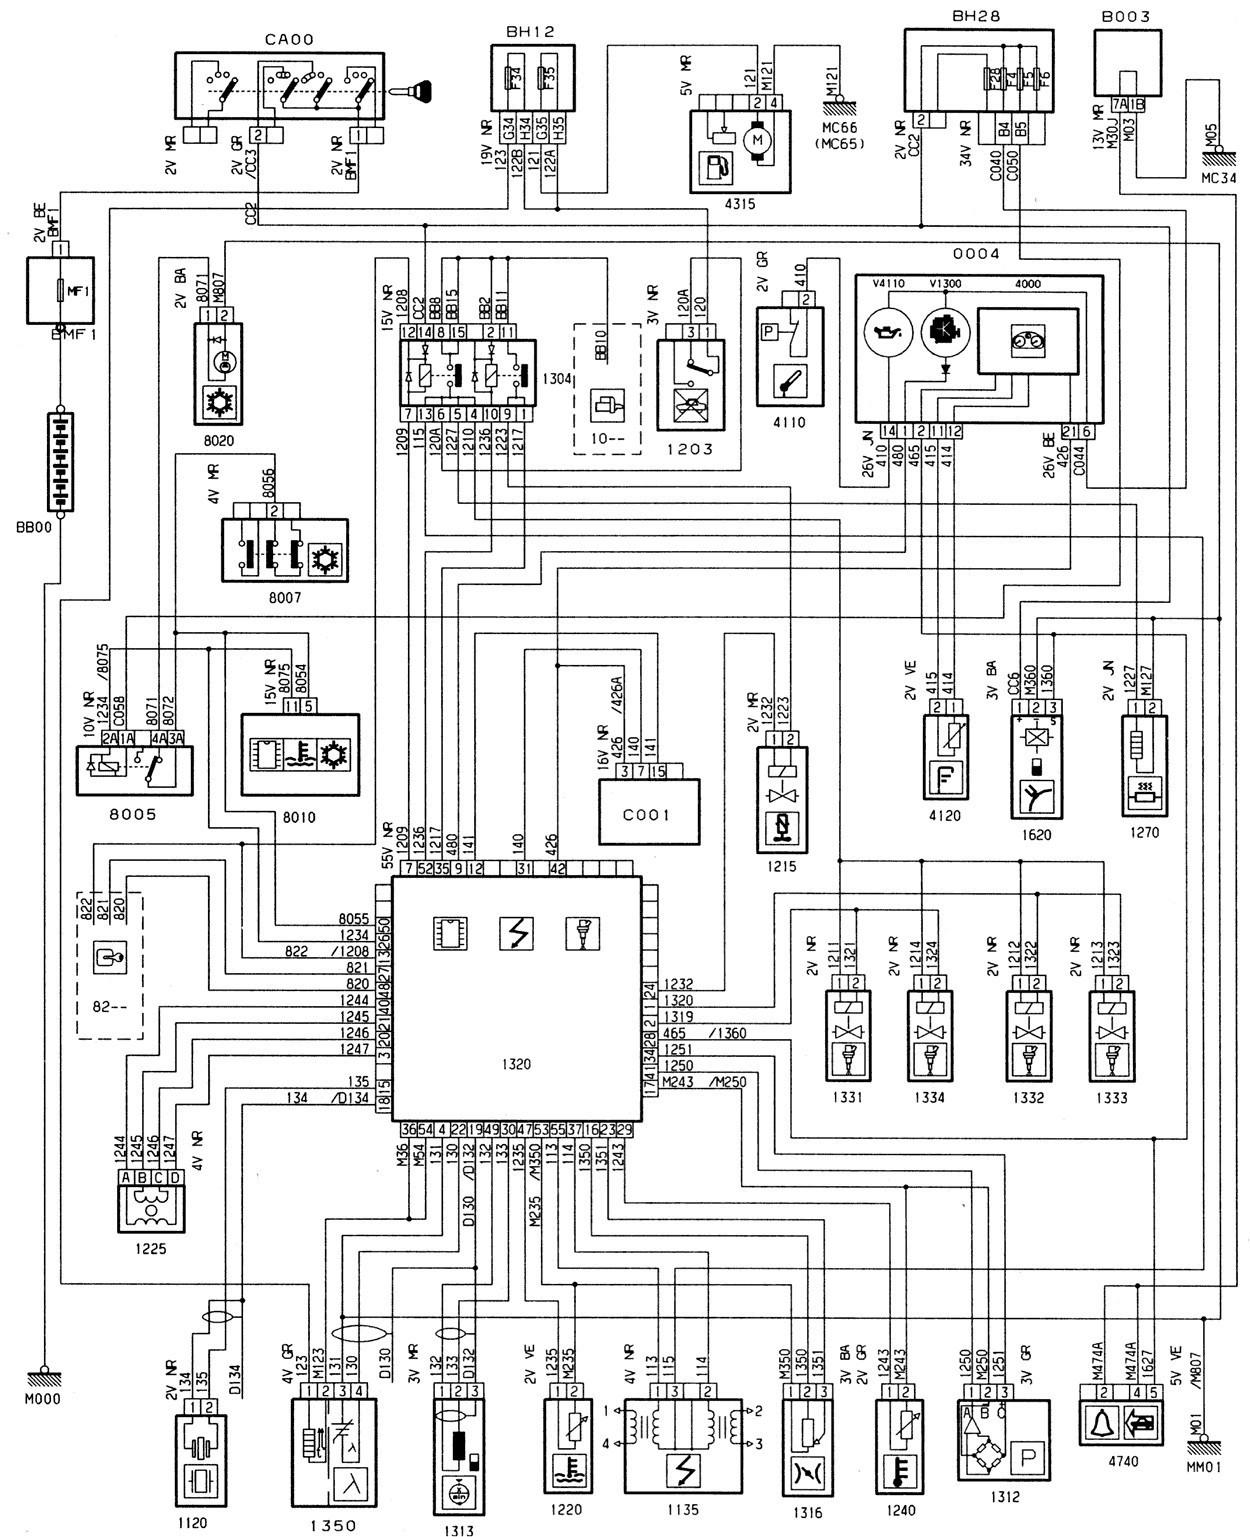 Peugeot 206 Engine Diagram Wiring Diagram Peugeot 206